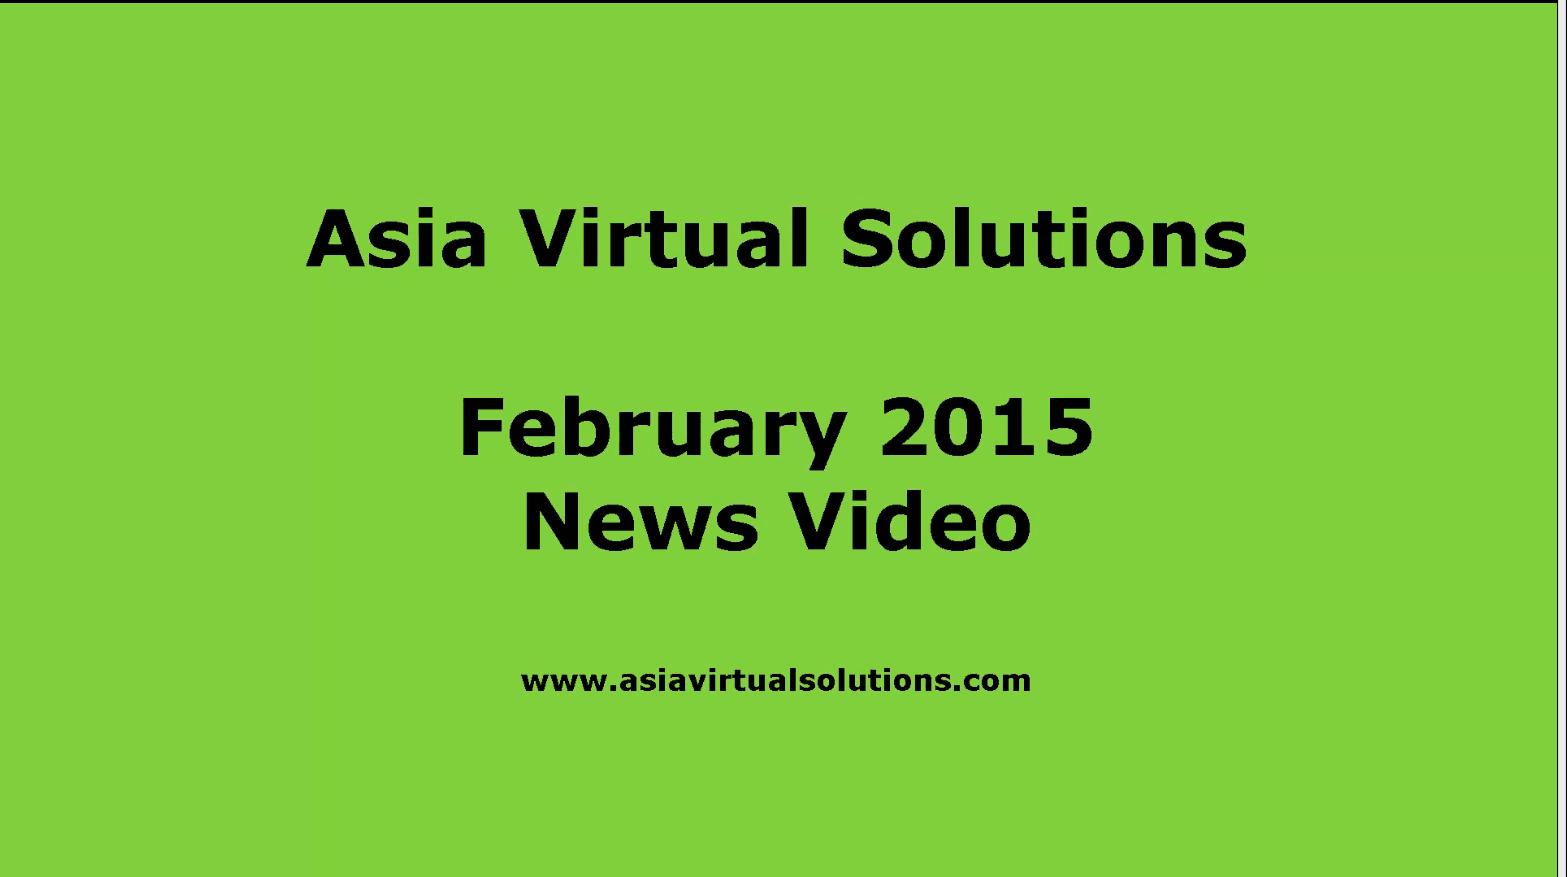 February News Video